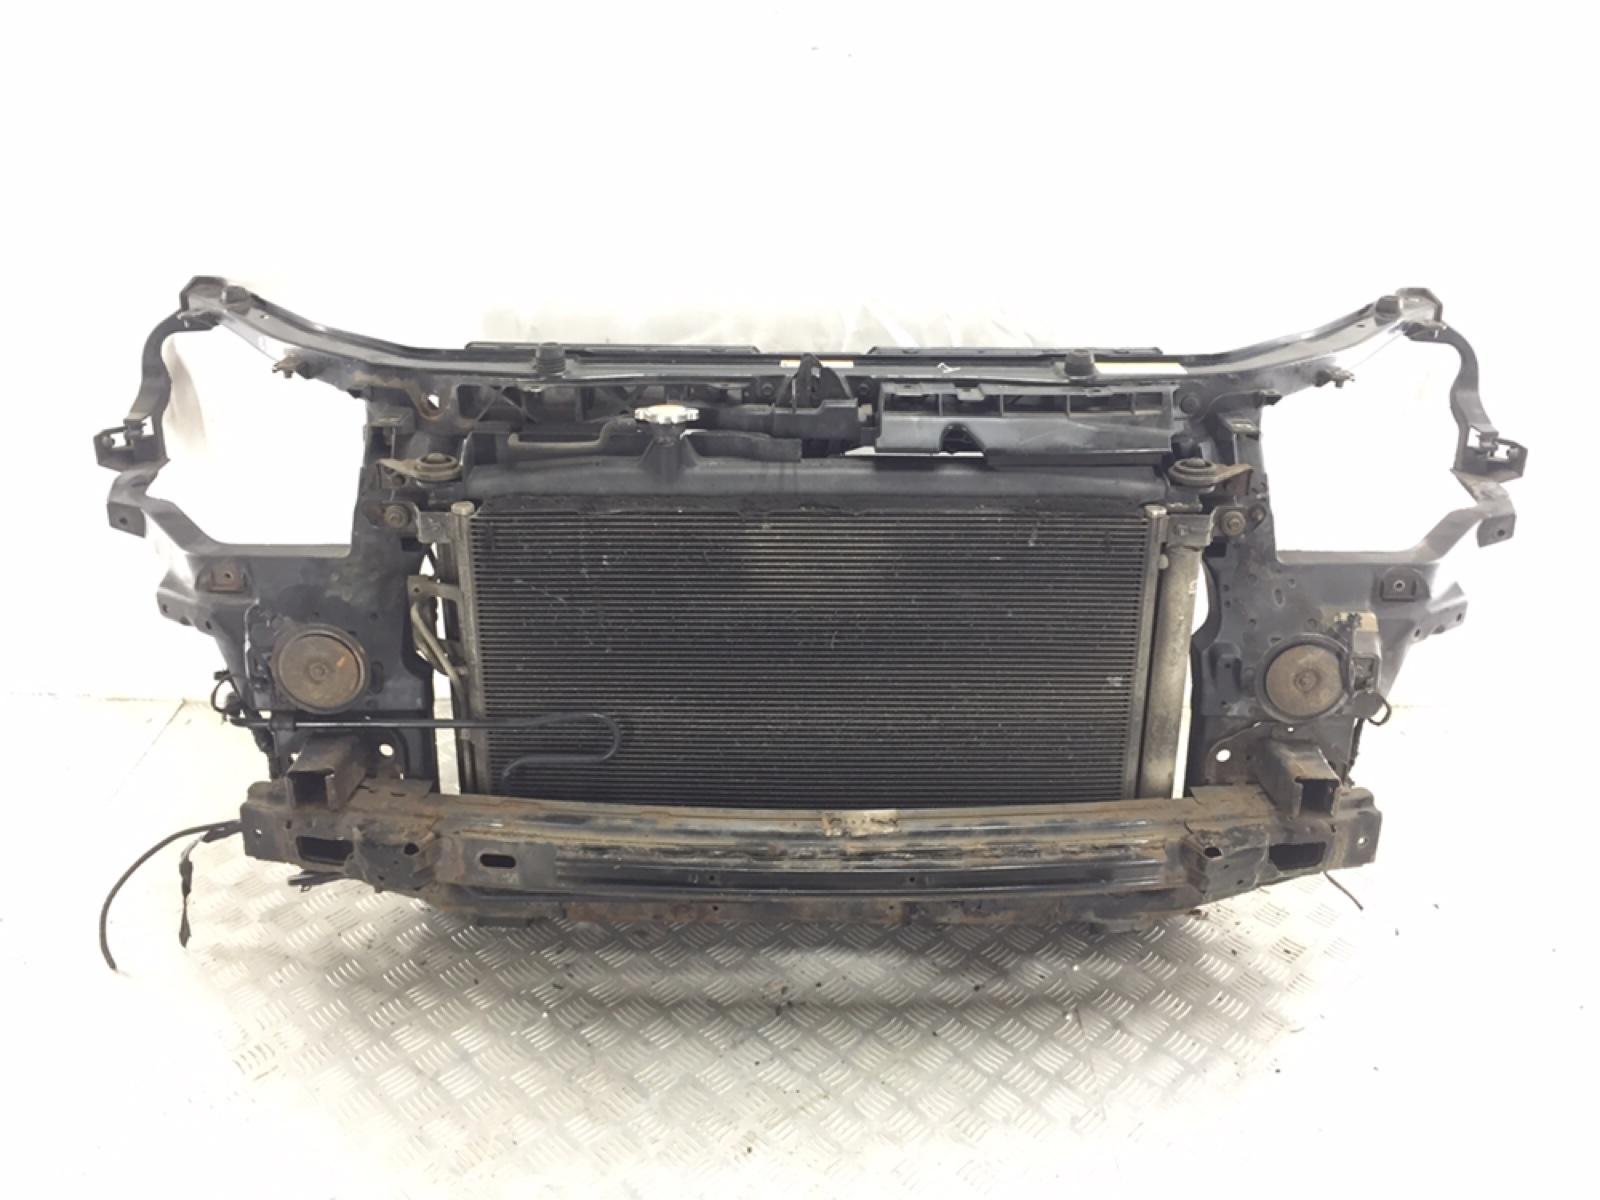 Панель передняя (телевизор) Hyundai Santa Fe 2.2 CRDI 2007 (б/у)